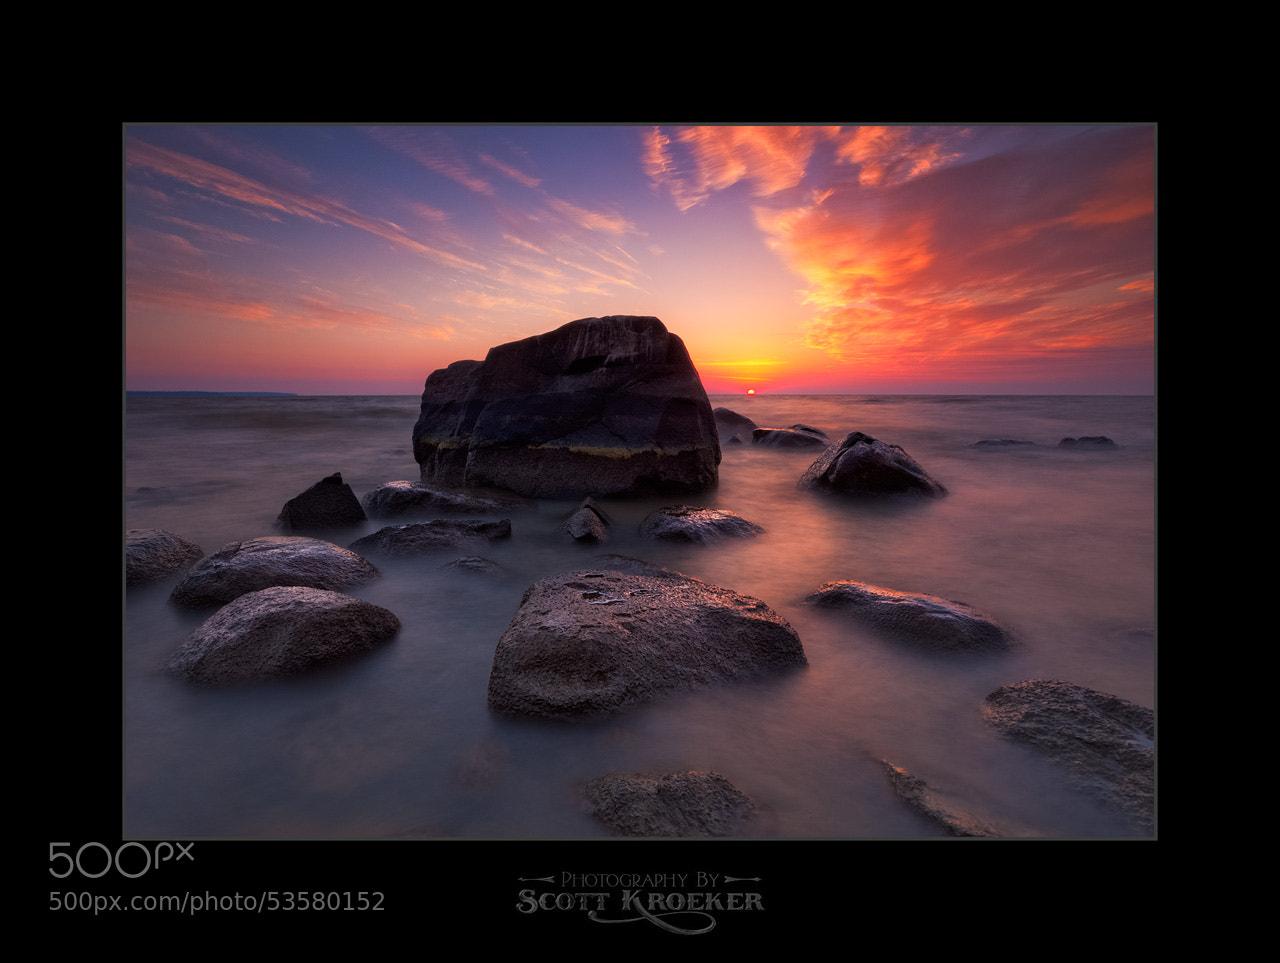 Photograph Boulder Sunset by Scott Kroeker on 500px